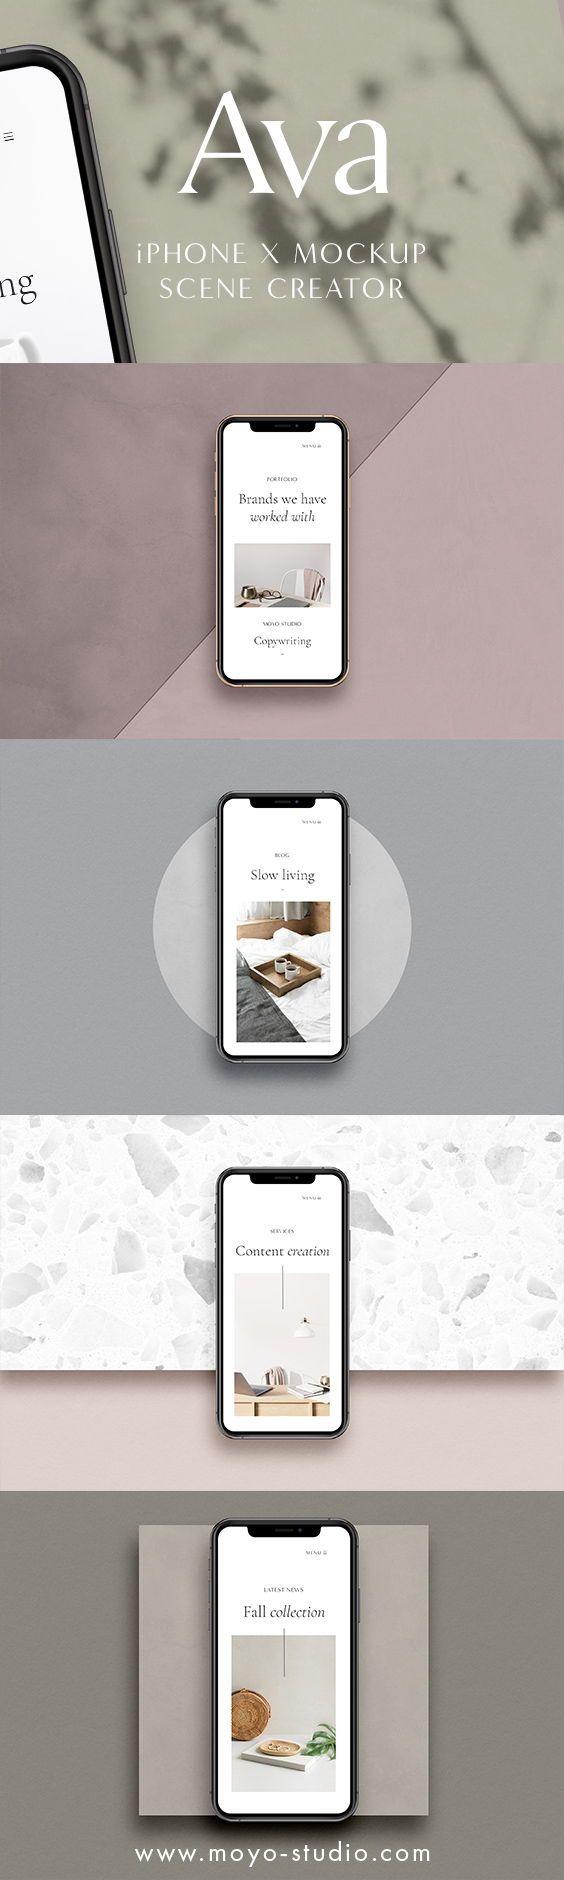 Download Ava Iphone Xs Mockup Scene Creator Moyo Studio Scene Creator Iphone Mockup Iphone Colors